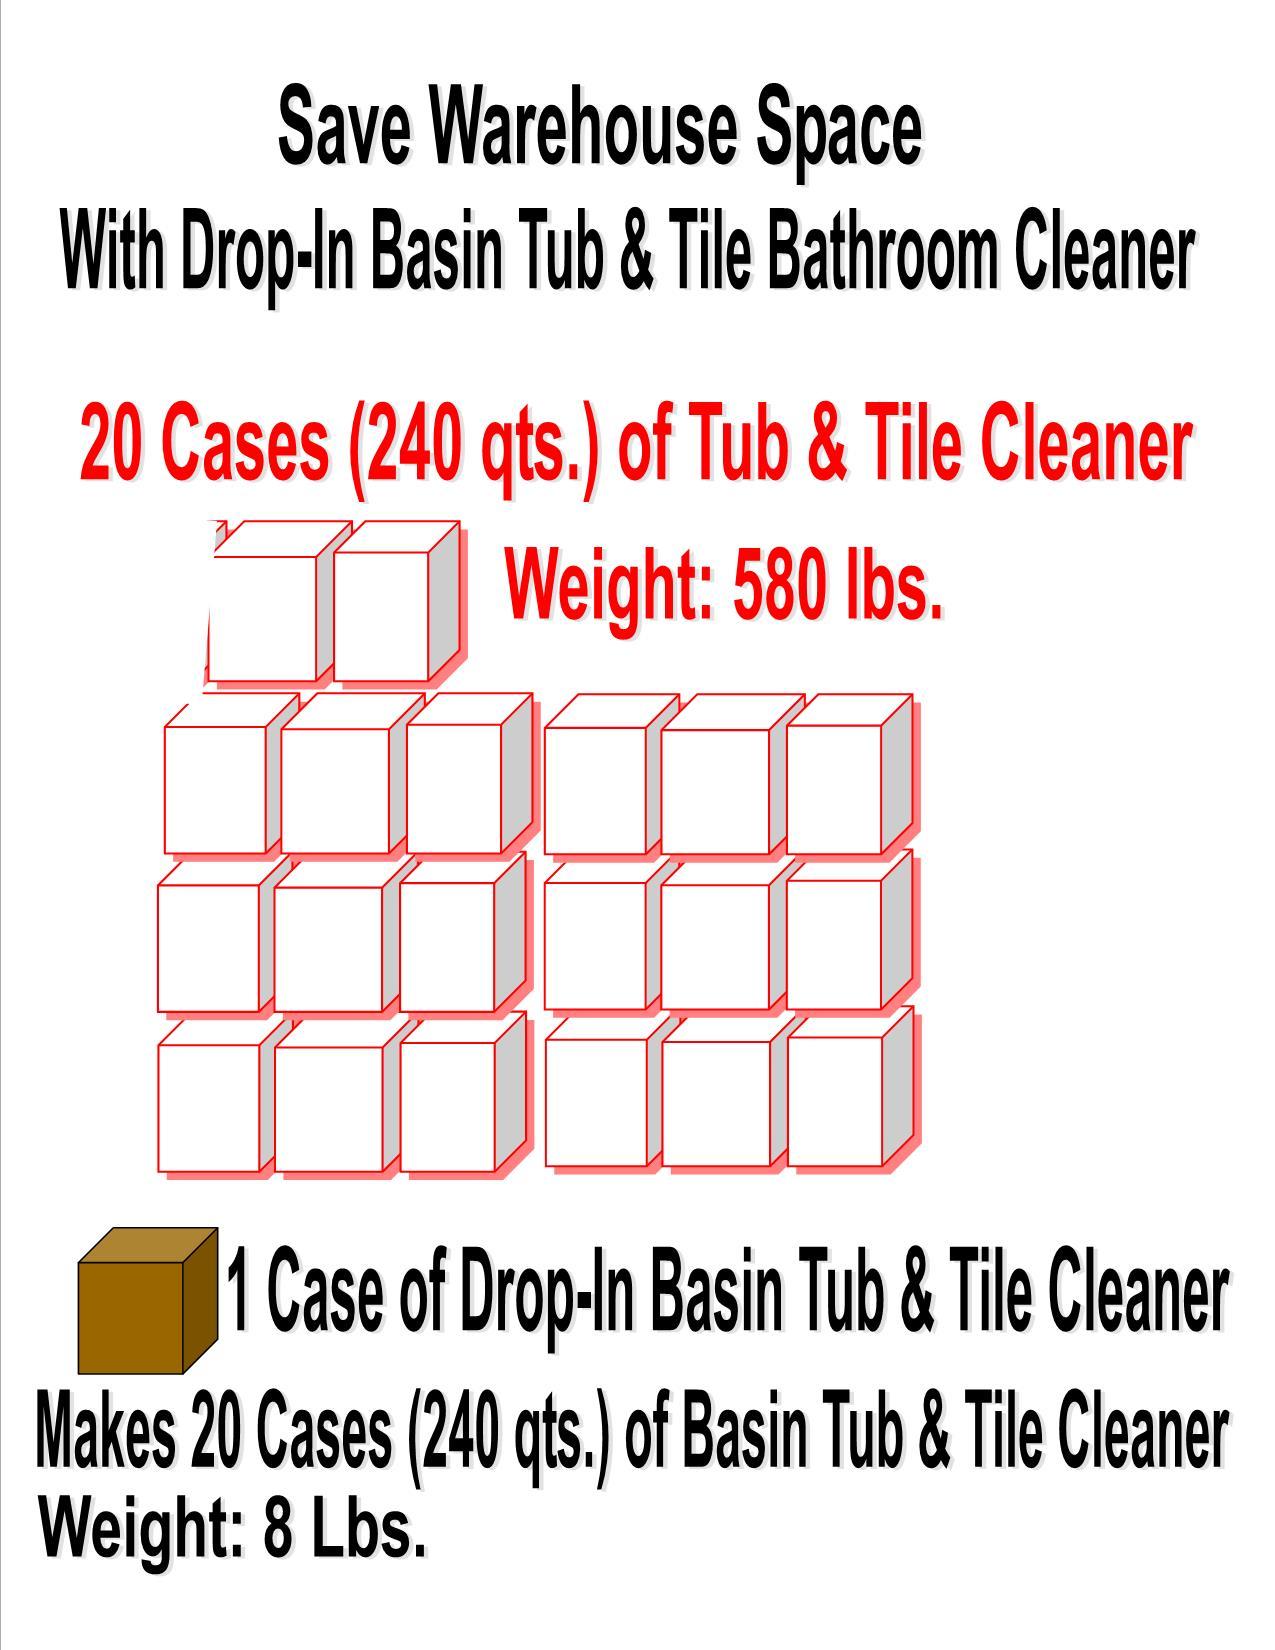 DropIn Basin Tub Tile Bathroom Cleaner Major Supply Corp - Tub and tile bathroom cleaner